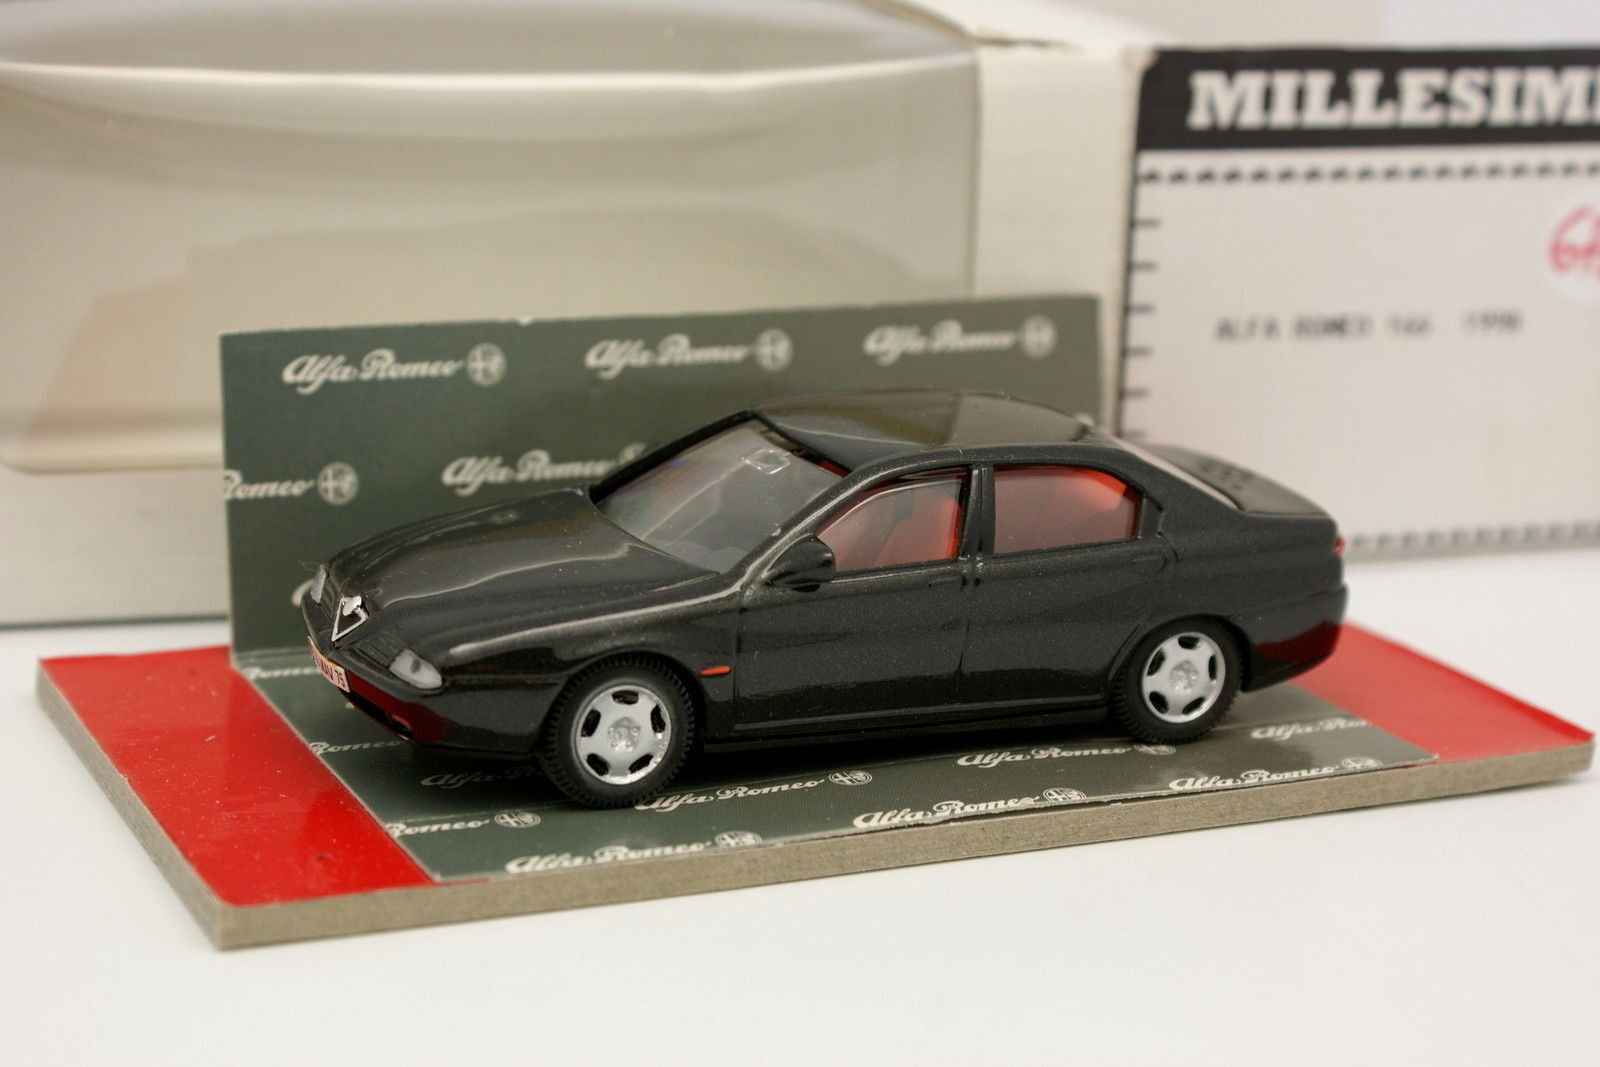 MC Modelli Resina 166 1 43 - Alfa Romeo 166 Resina Nero c82188